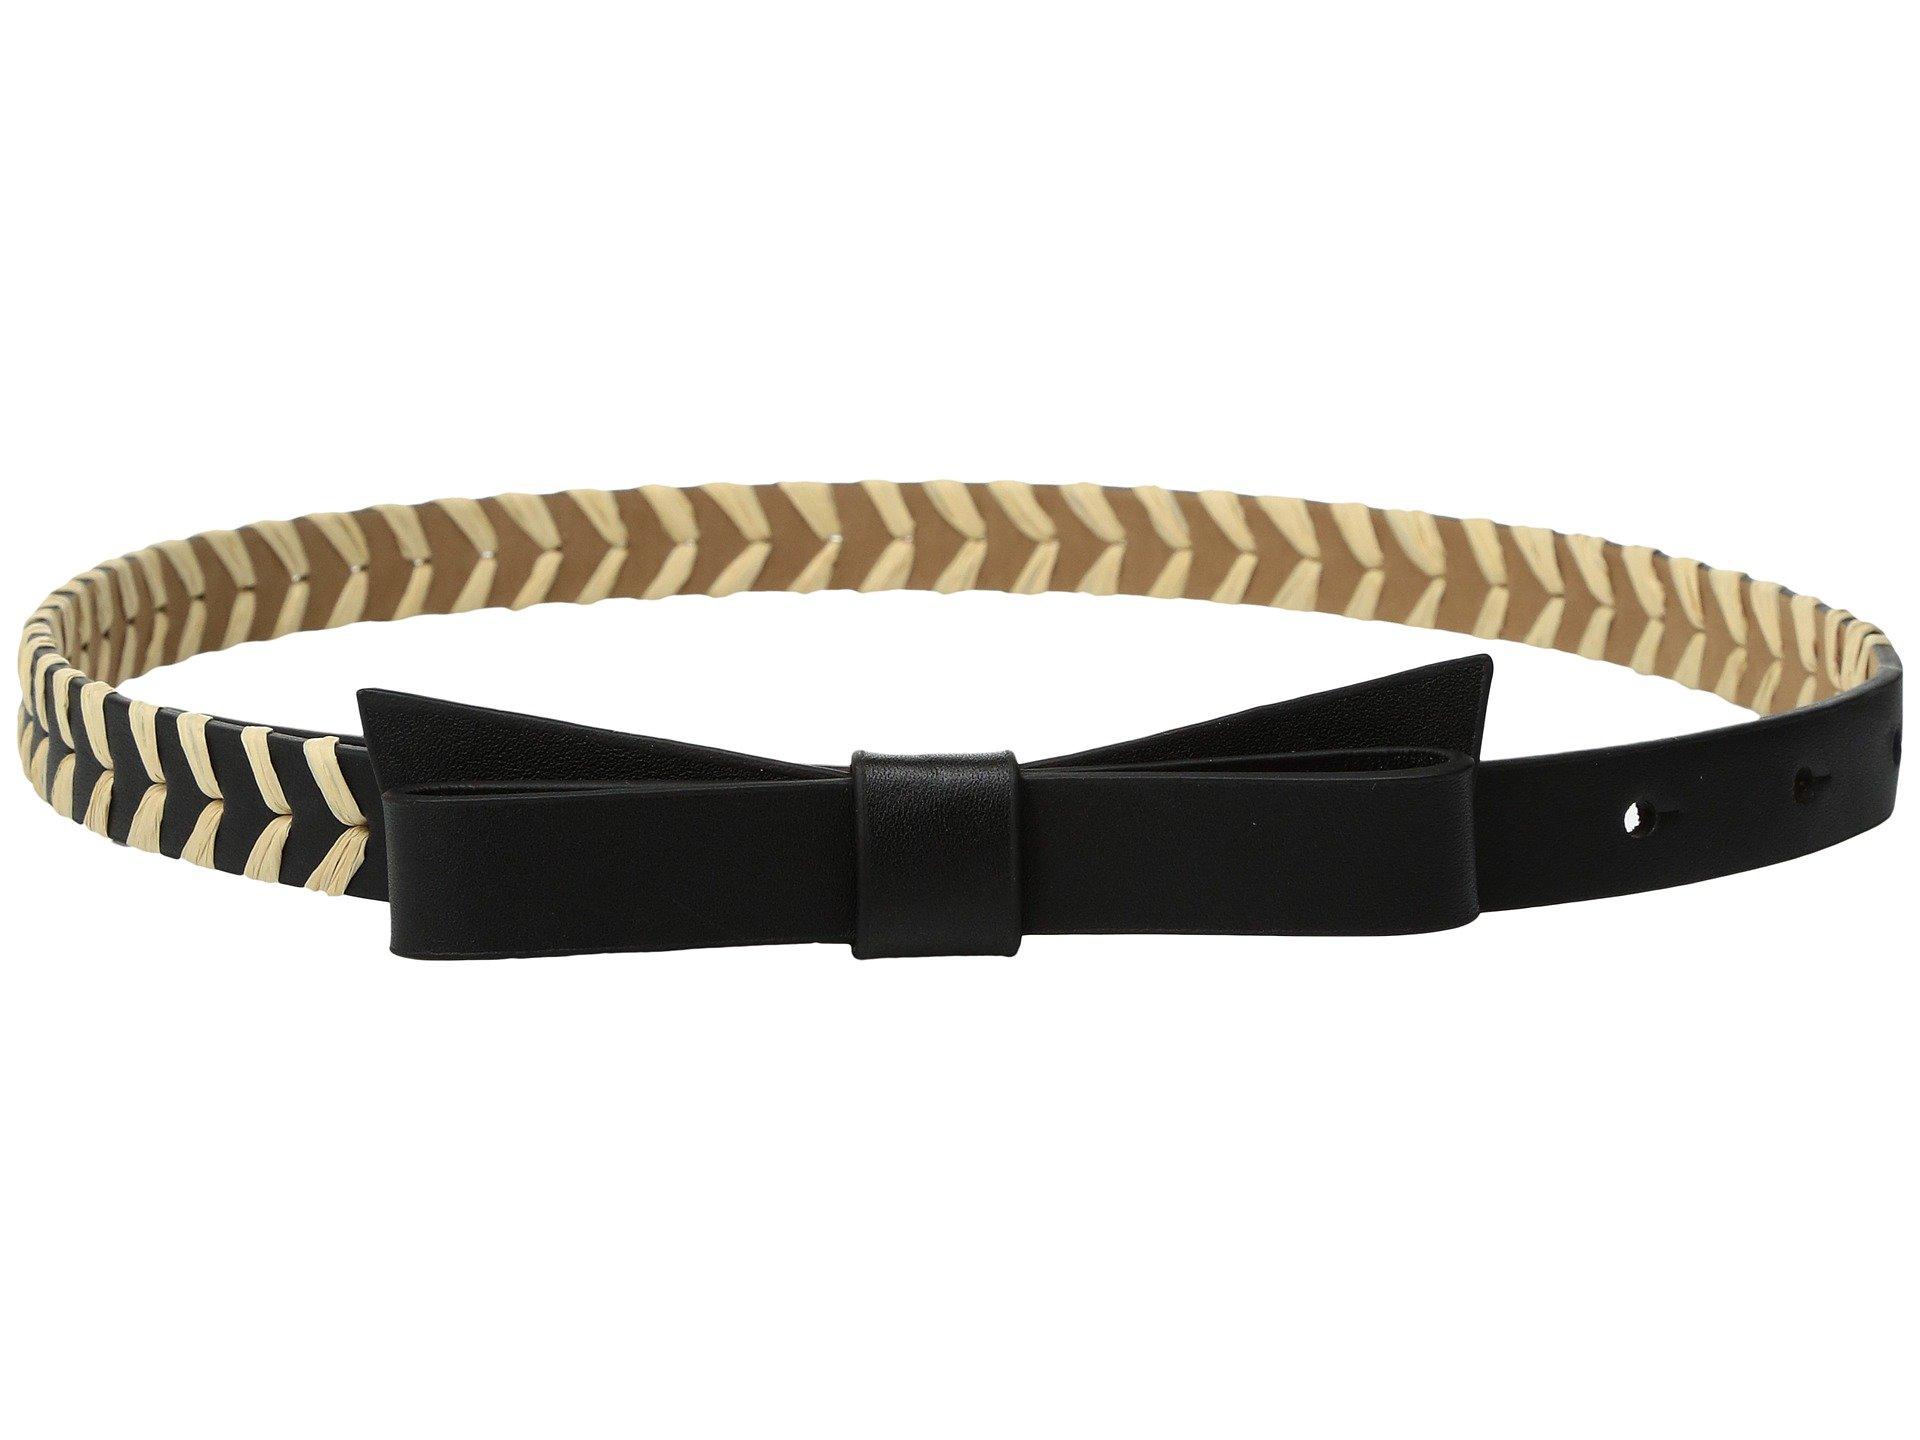 "Correa o Cinturon para Mujer Kate Spade New York 5/8"" Calf Bow Belt w/ Straw Detail  + Kate Spade New York en VeoyCompro.net"